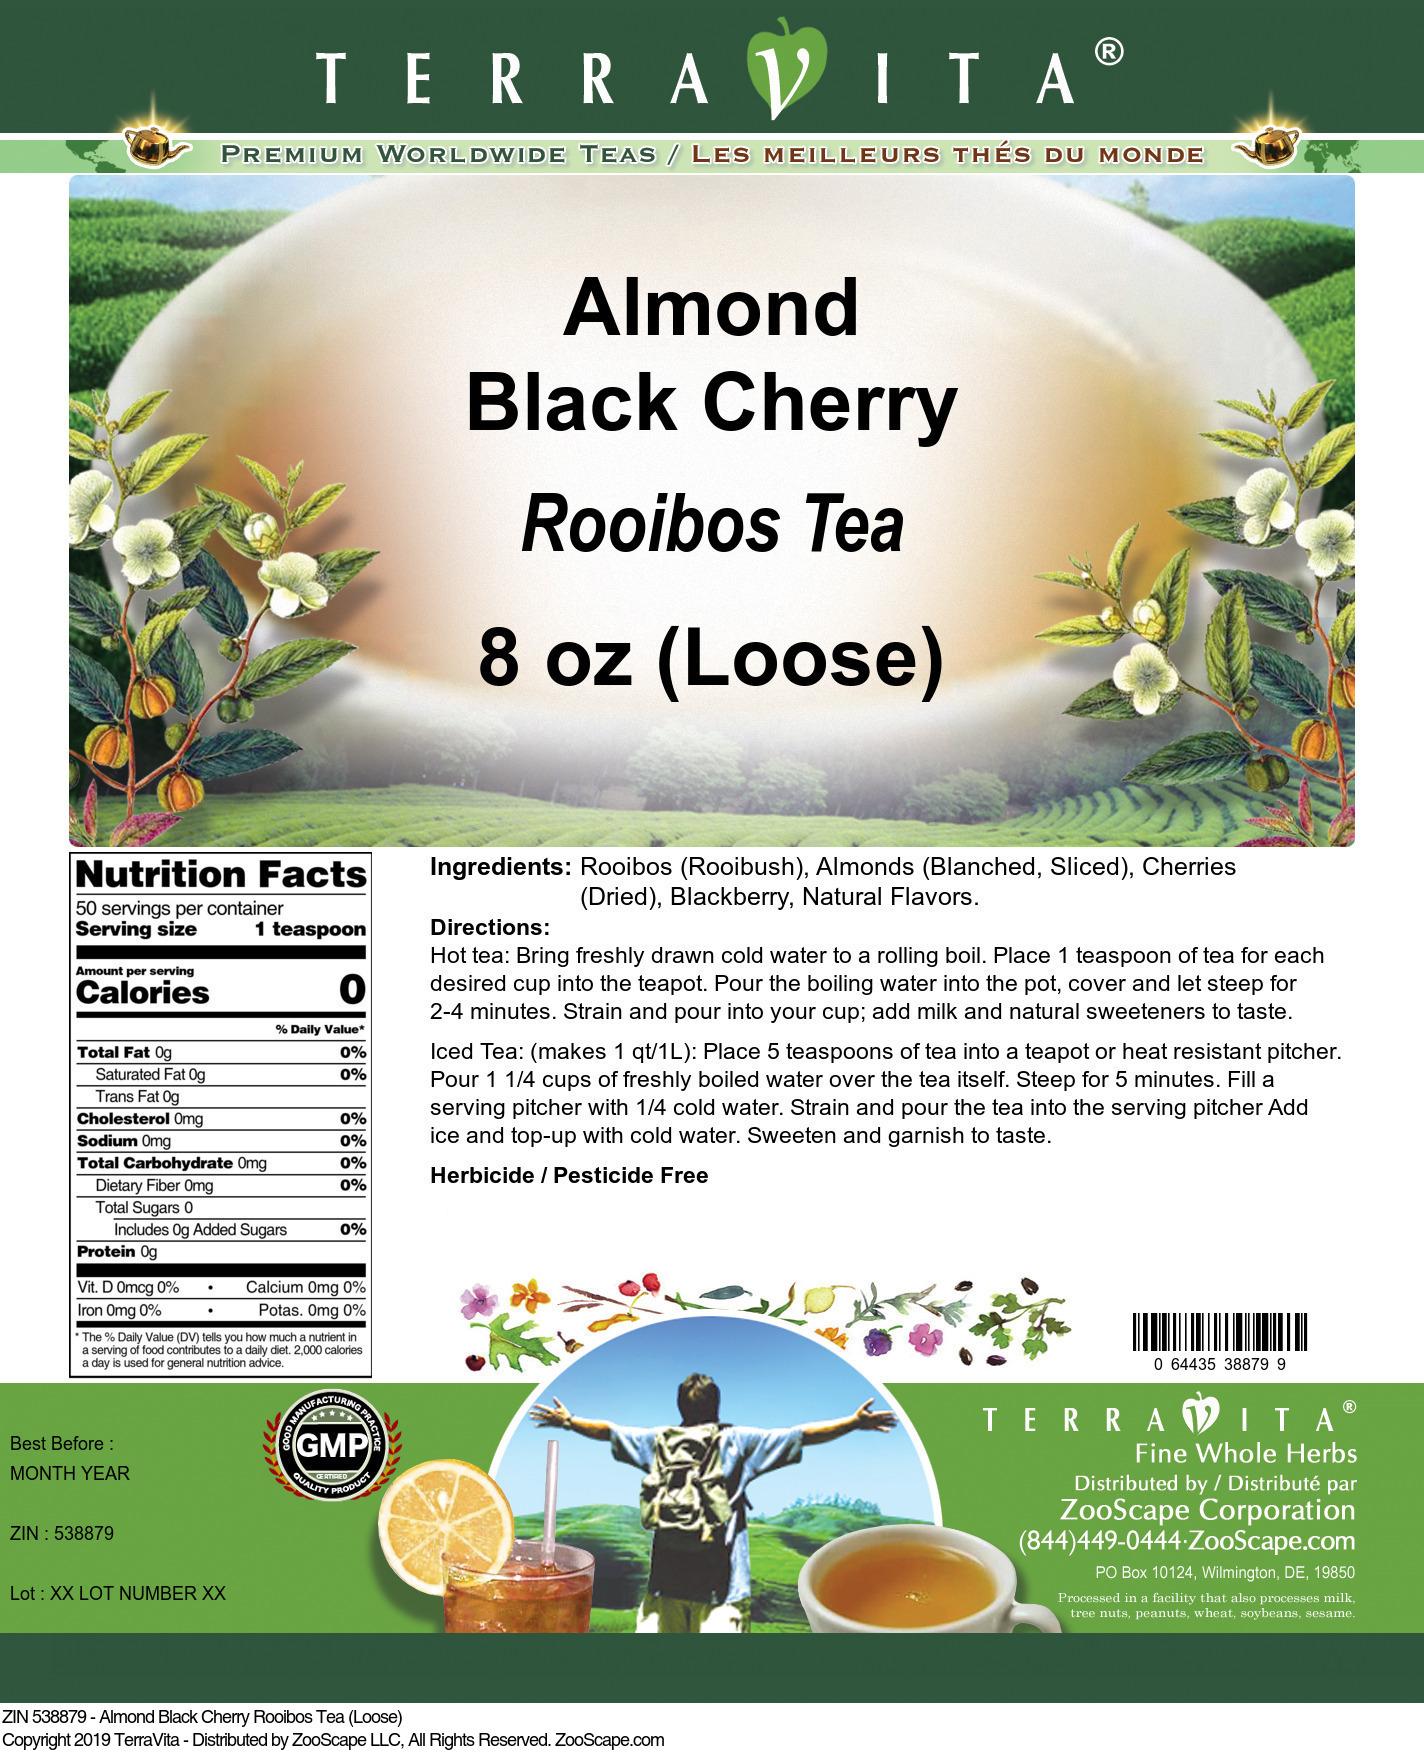 Almond Black Cherry Rooibos Tea (Loose)